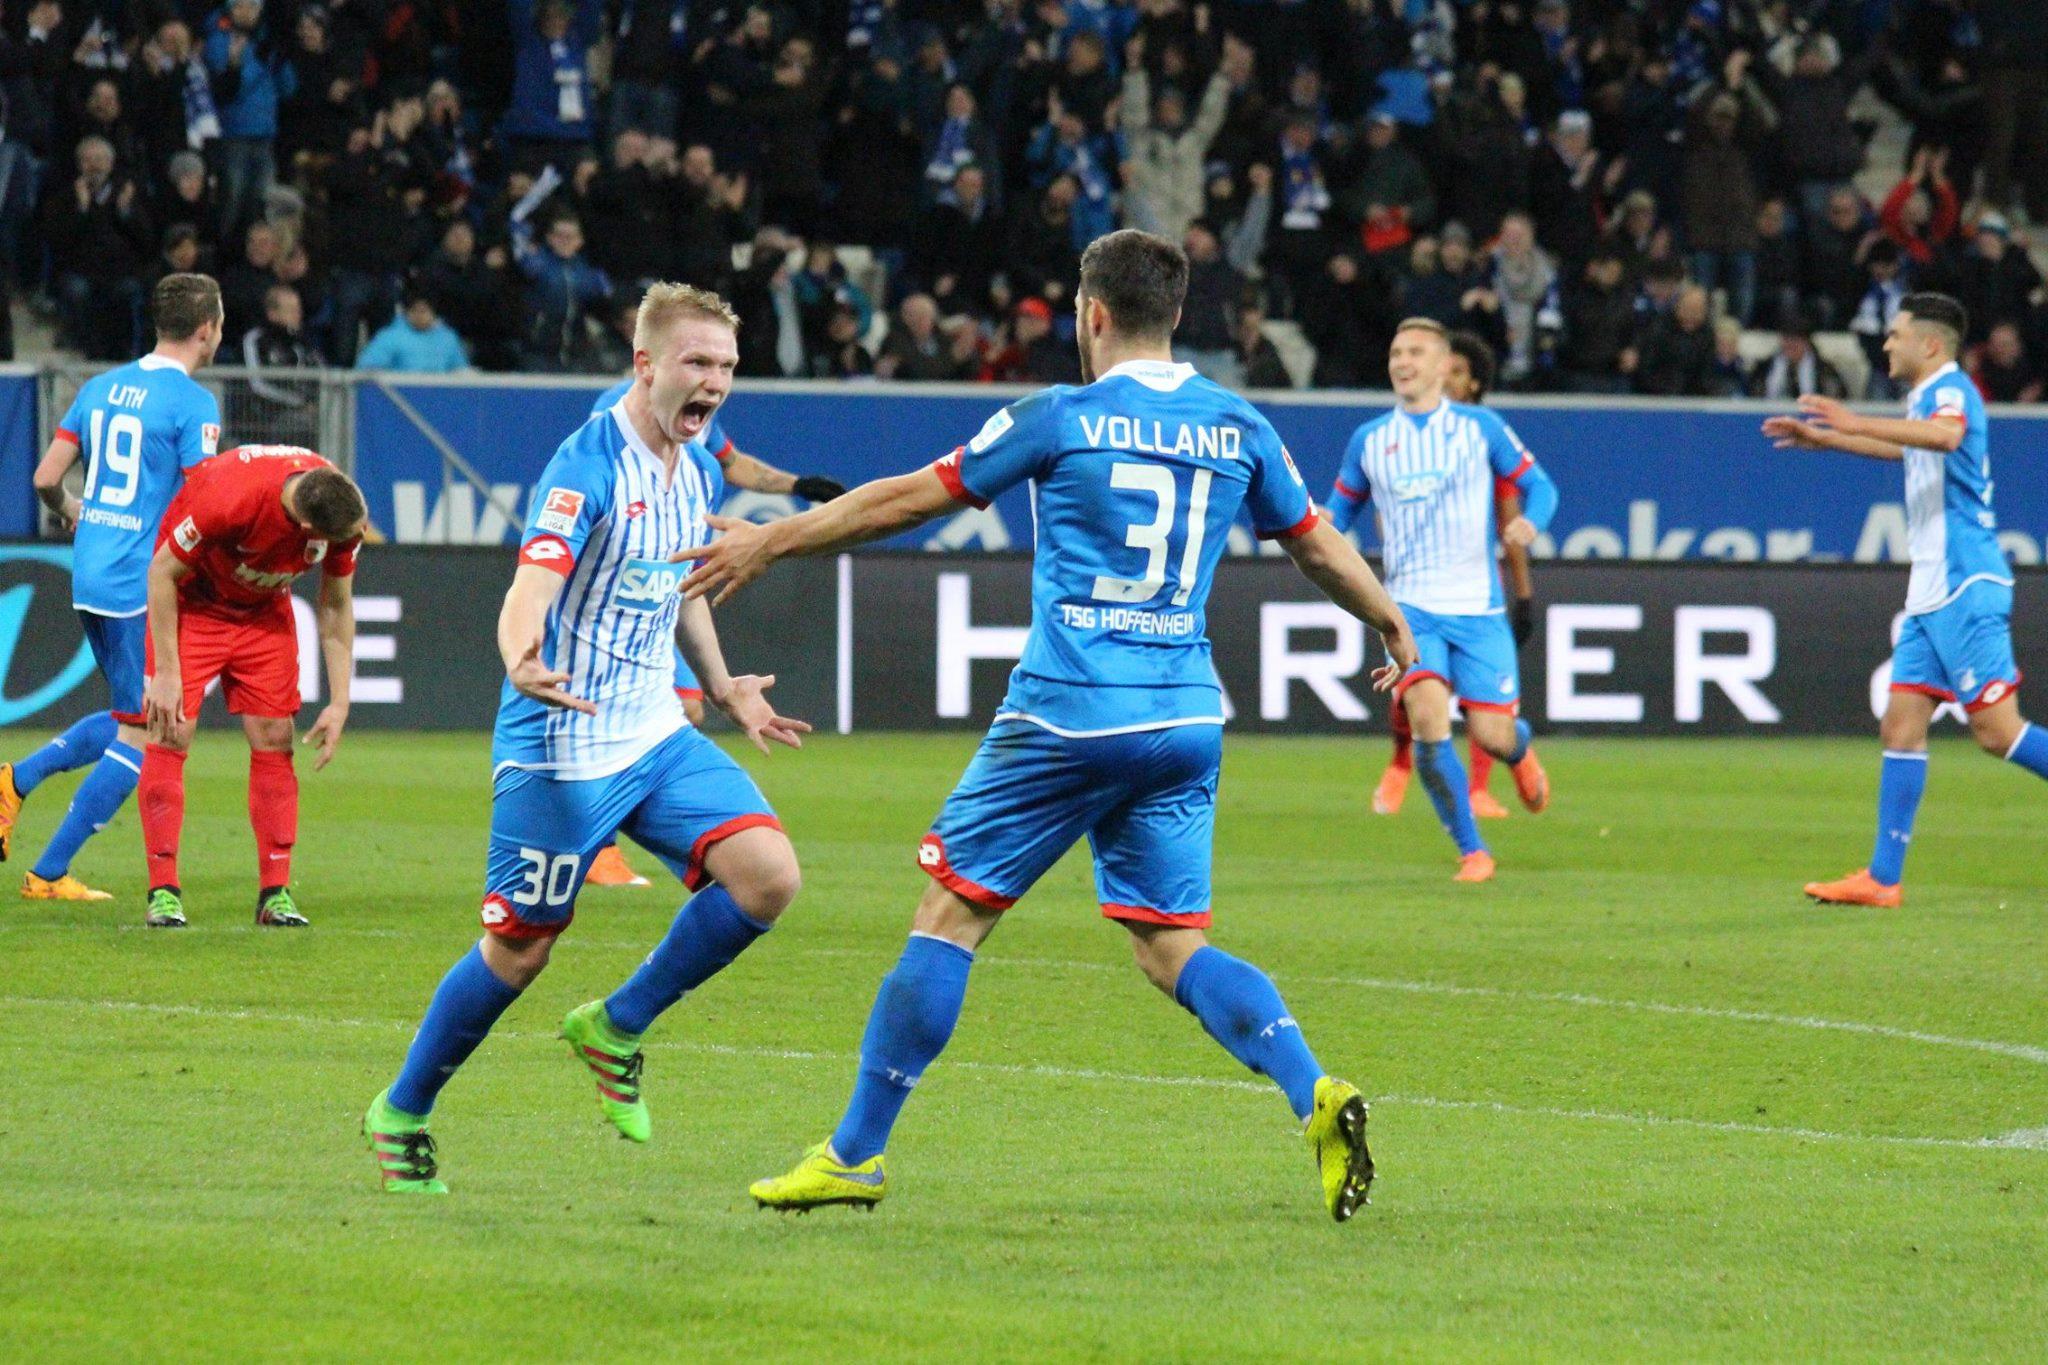 TSG Hoffenheim vs. FC Augsburg